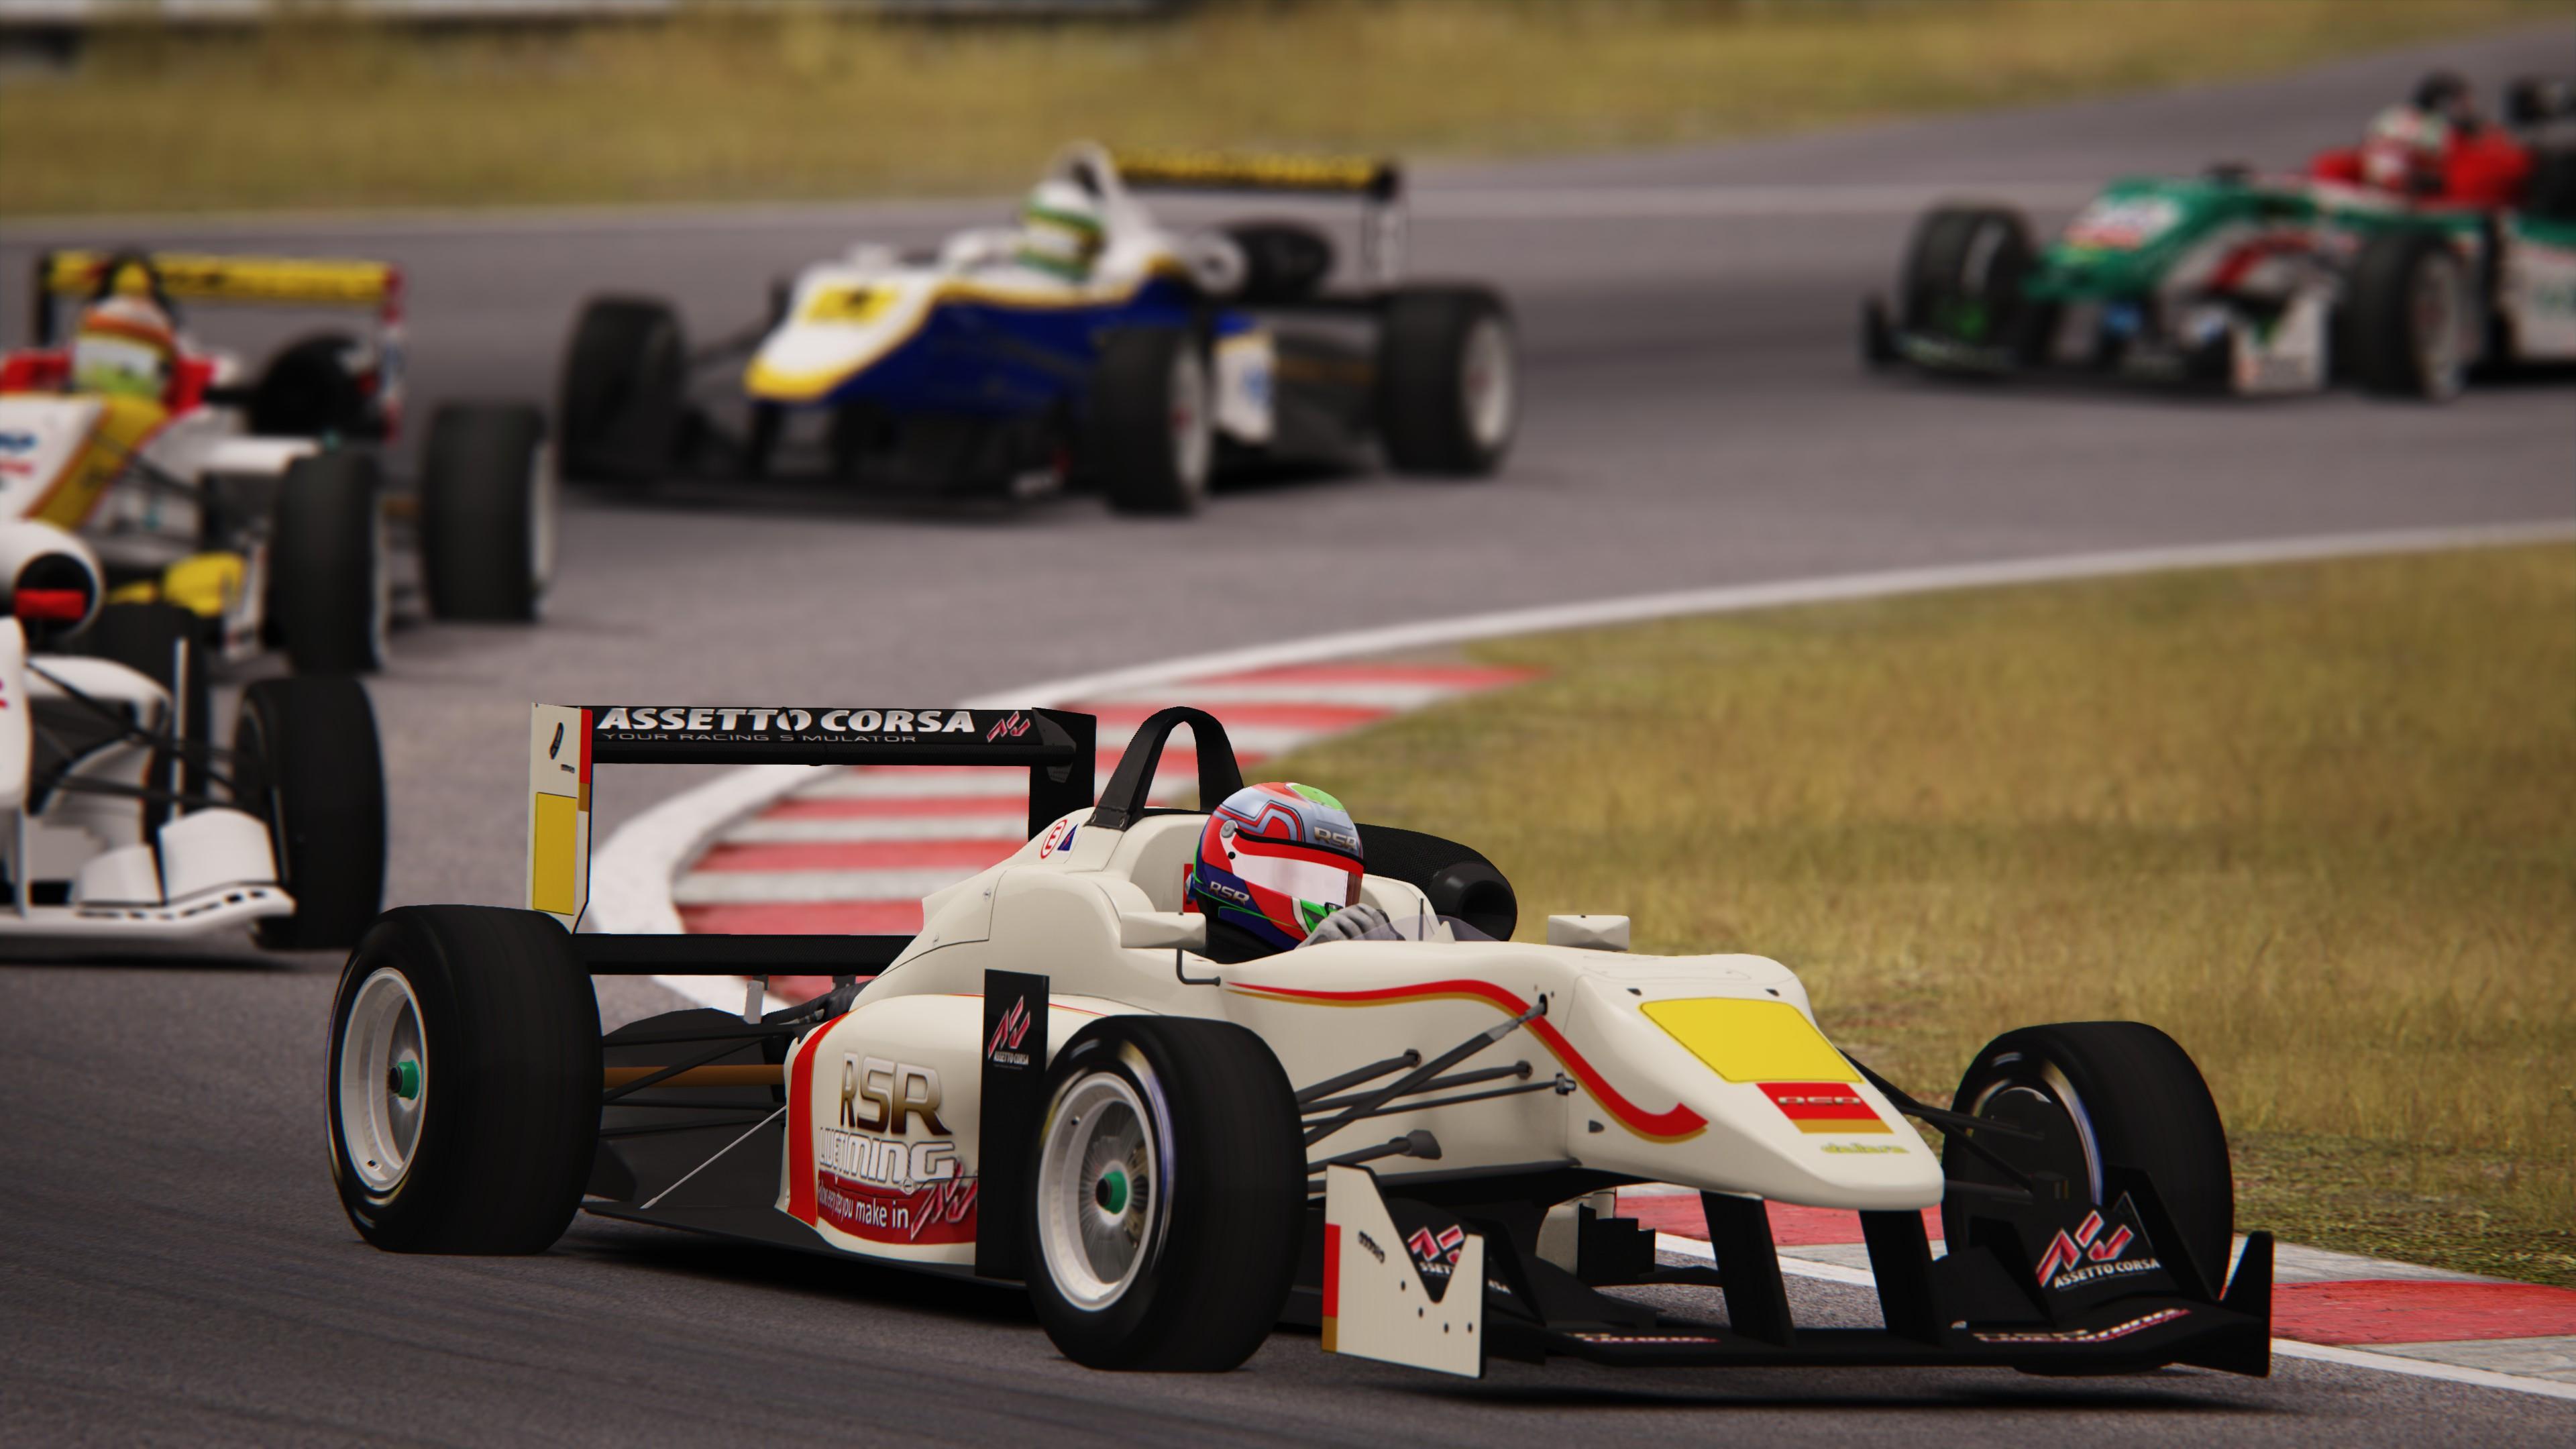 RSR Formula Three Mod - Assetto Corsa.jpg